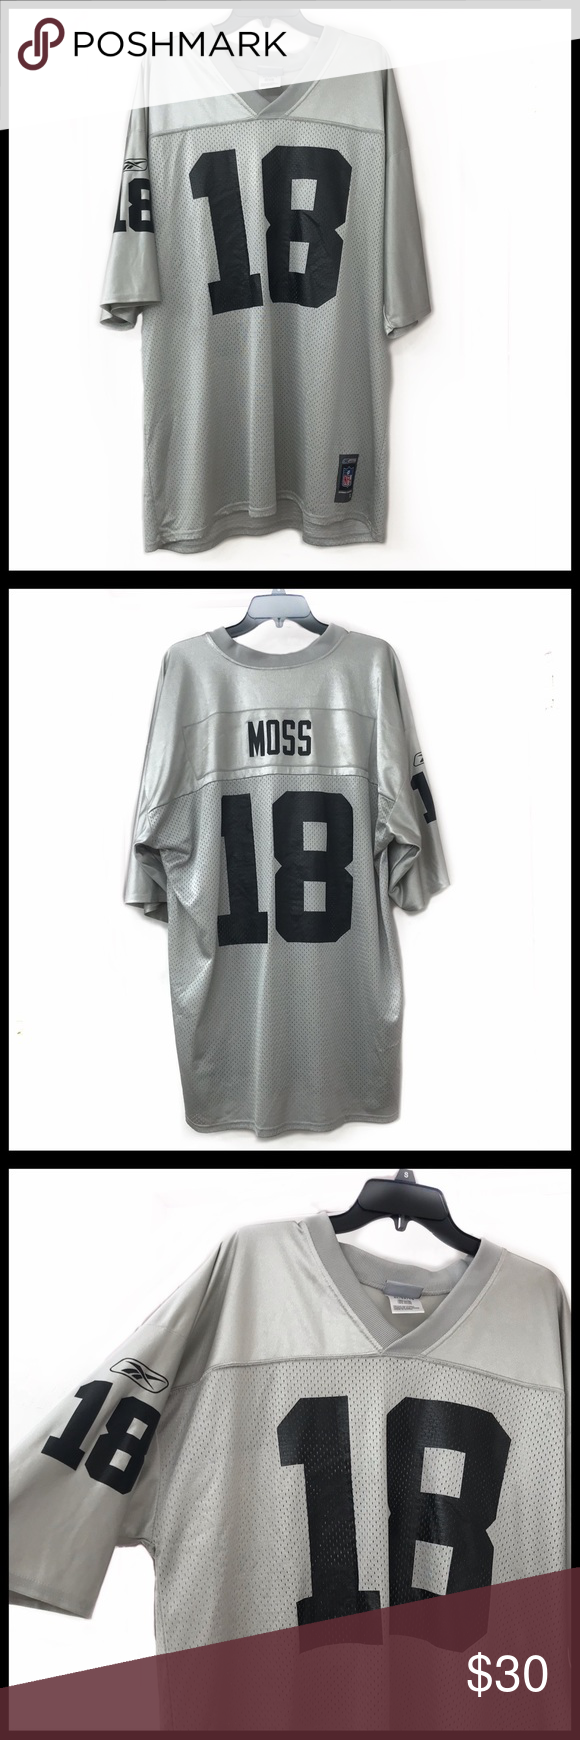 new product 9740d b8f74 Reebok Oakland Raider Randy Moss Jersey Reebok Oakland ...